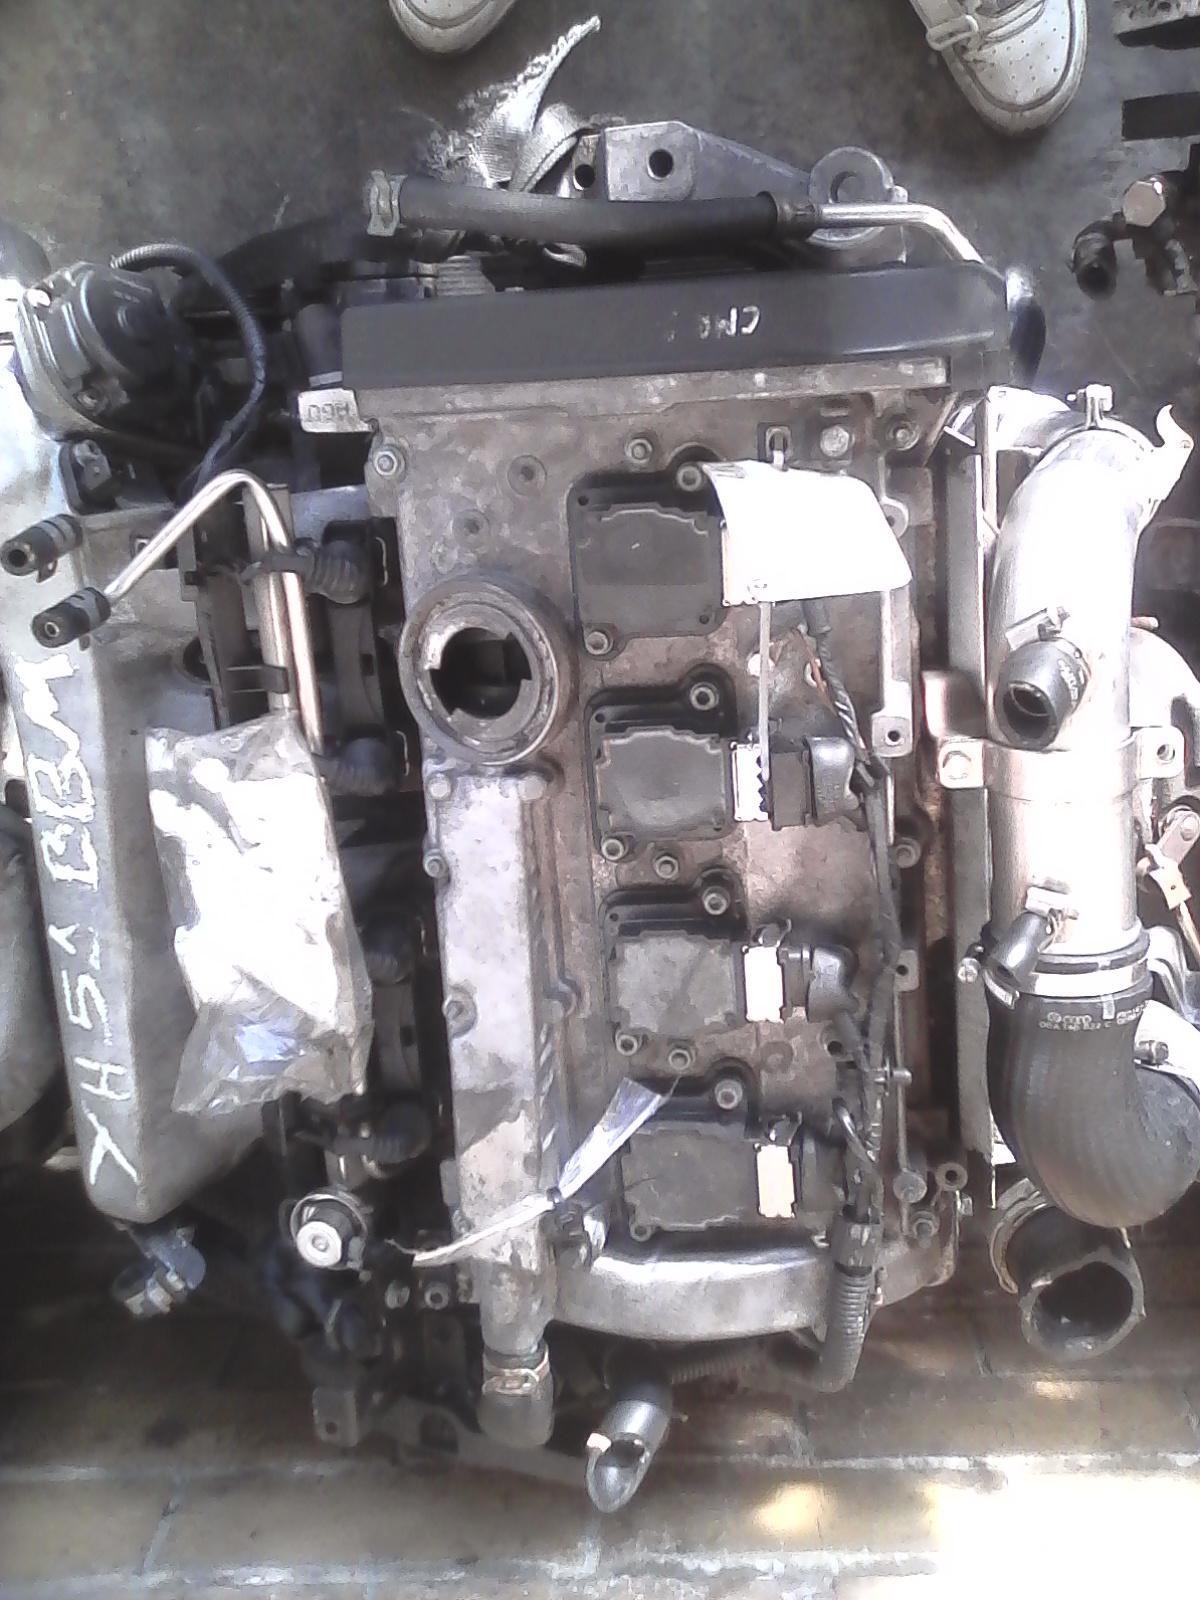 Vw Golf 5 1 8t Agu Engine For Sale Johannesburg